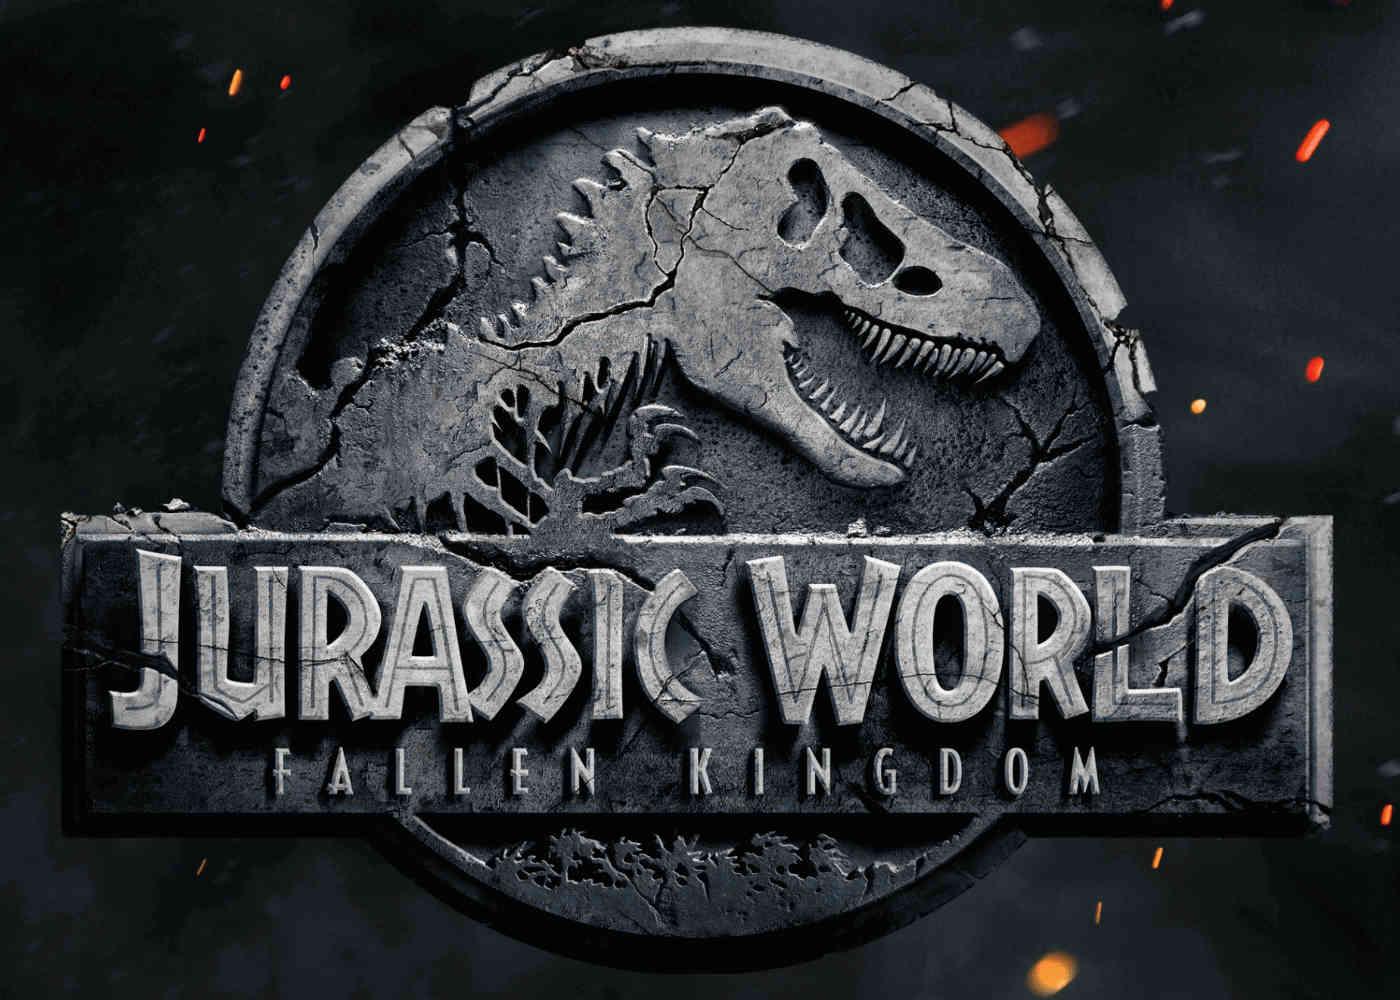 Jurassic World: Fallen Kingdom Trailer to Debut with The Last Jedi?